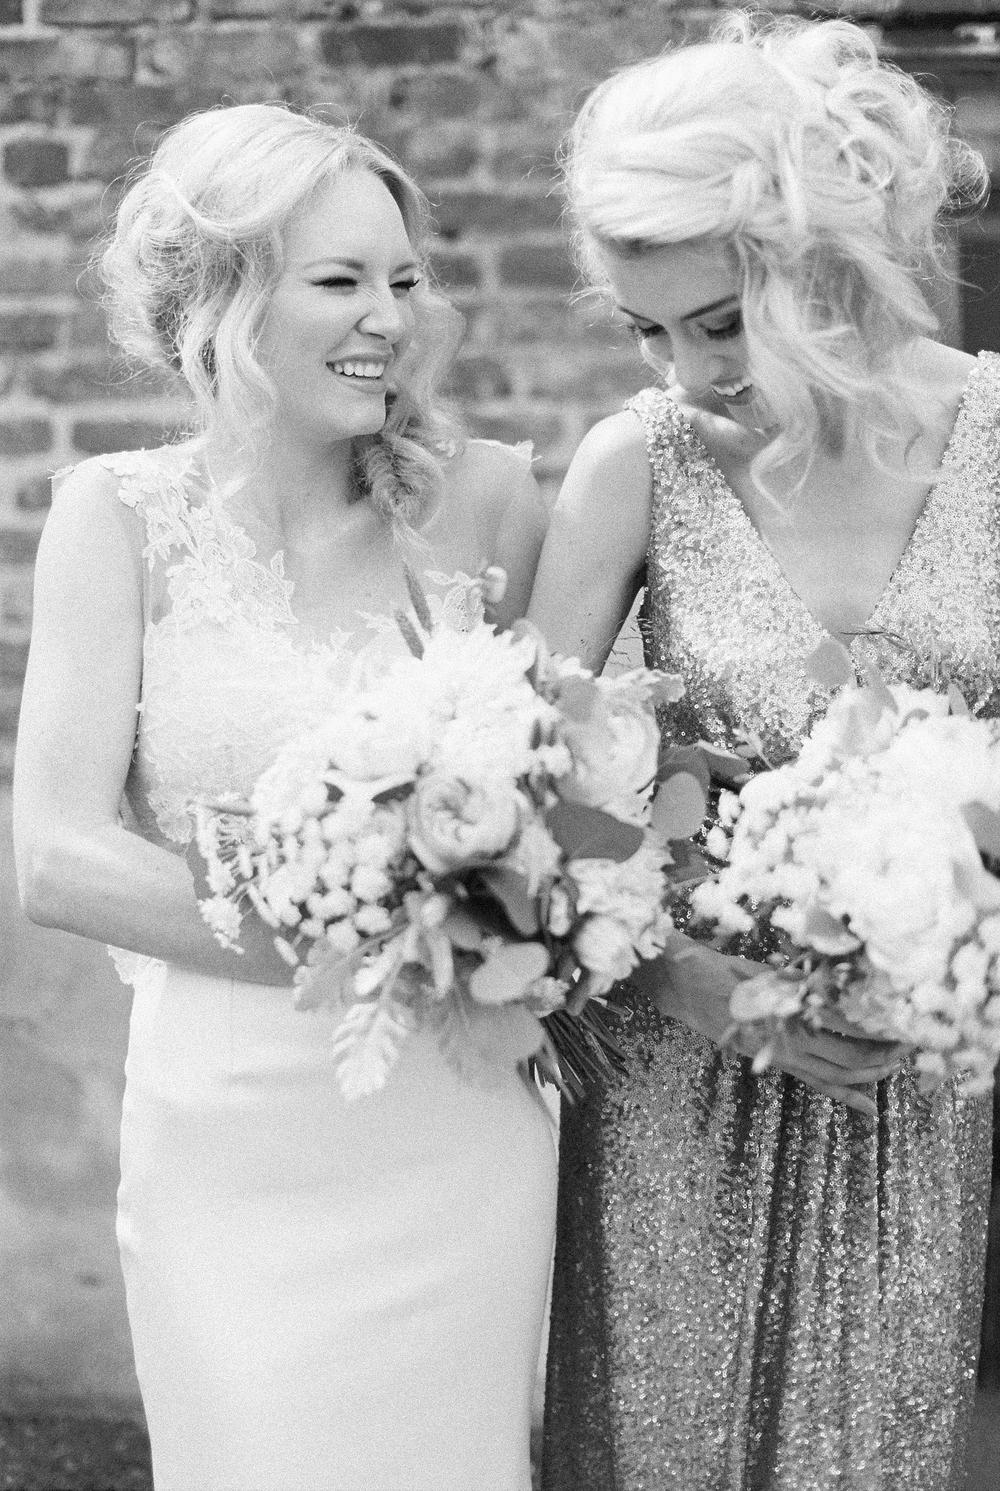 Blanc-Denver-wedding-inspiration-by-Lisa-O'Dwyer-Denver-fine-art-wedding-photographer-66.jpg